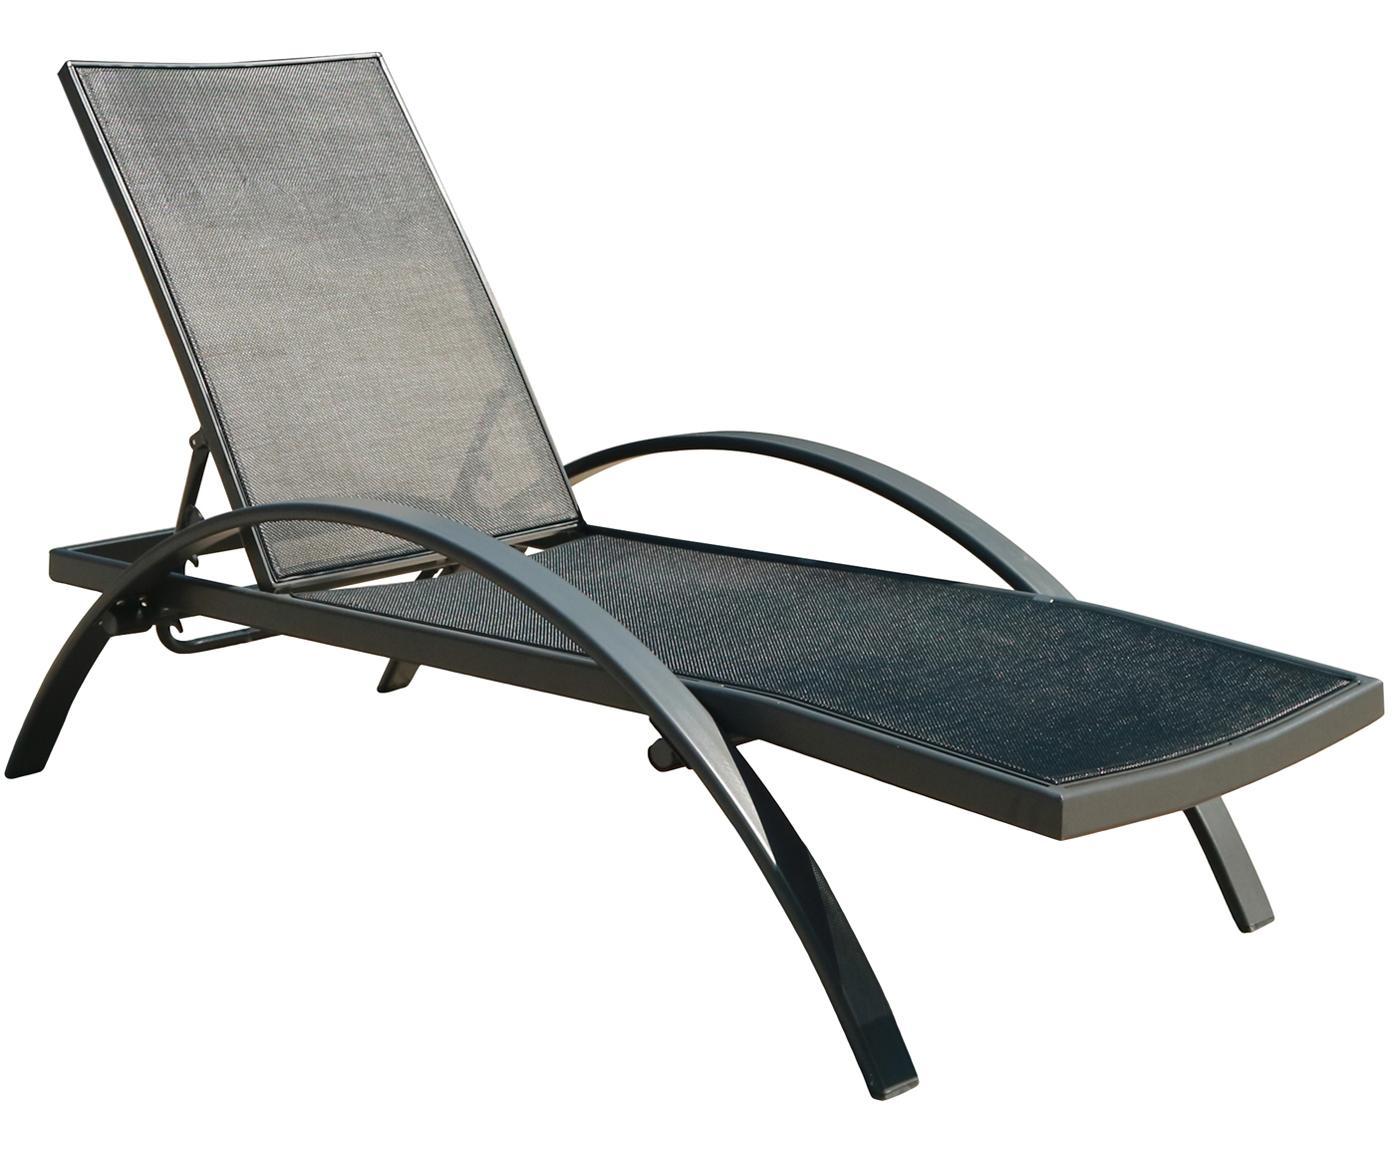 Zonnebed Eddy, Aluminium, textiel, Antraciet, zwart, 65 x 32 cm